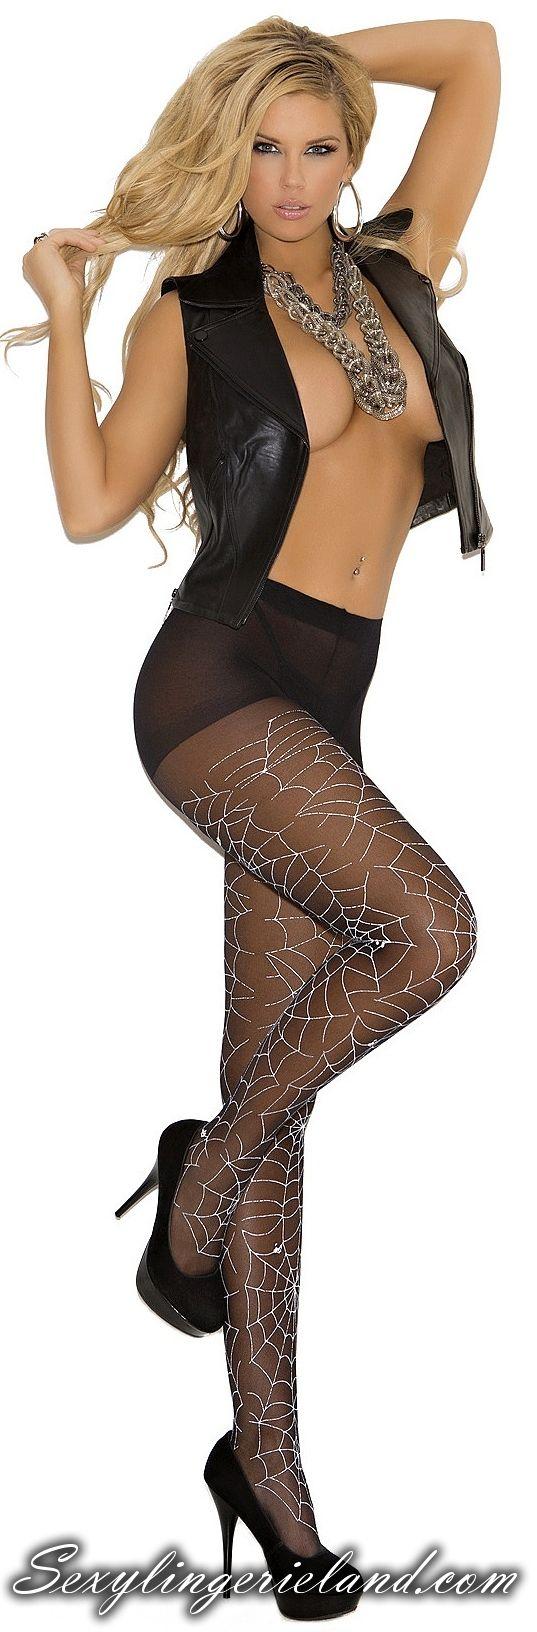 Pattern Sheer Pantyhose Quick Look 90